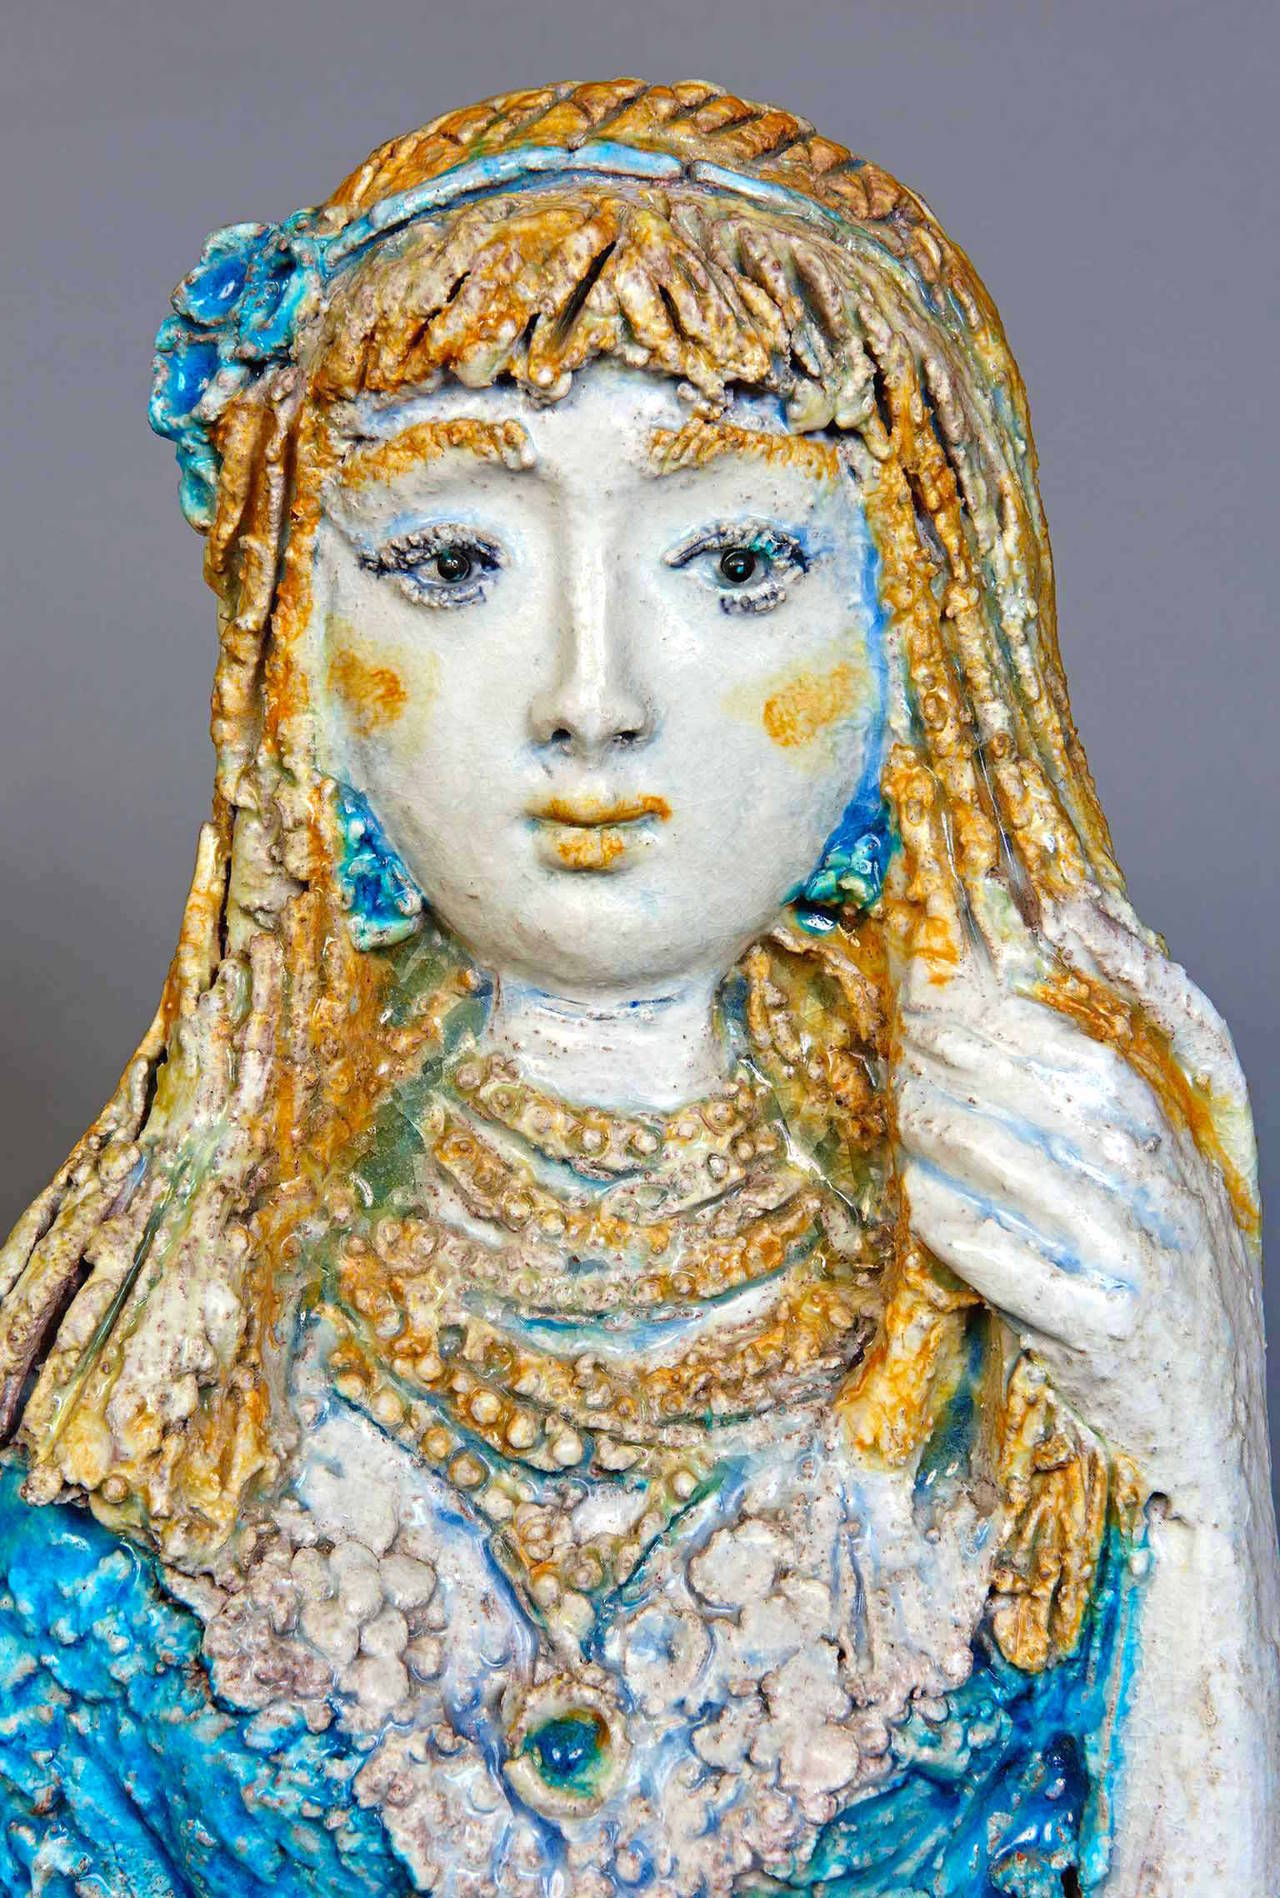 Modern Ceramic Sculpture by Ugo Lucerni For Sale